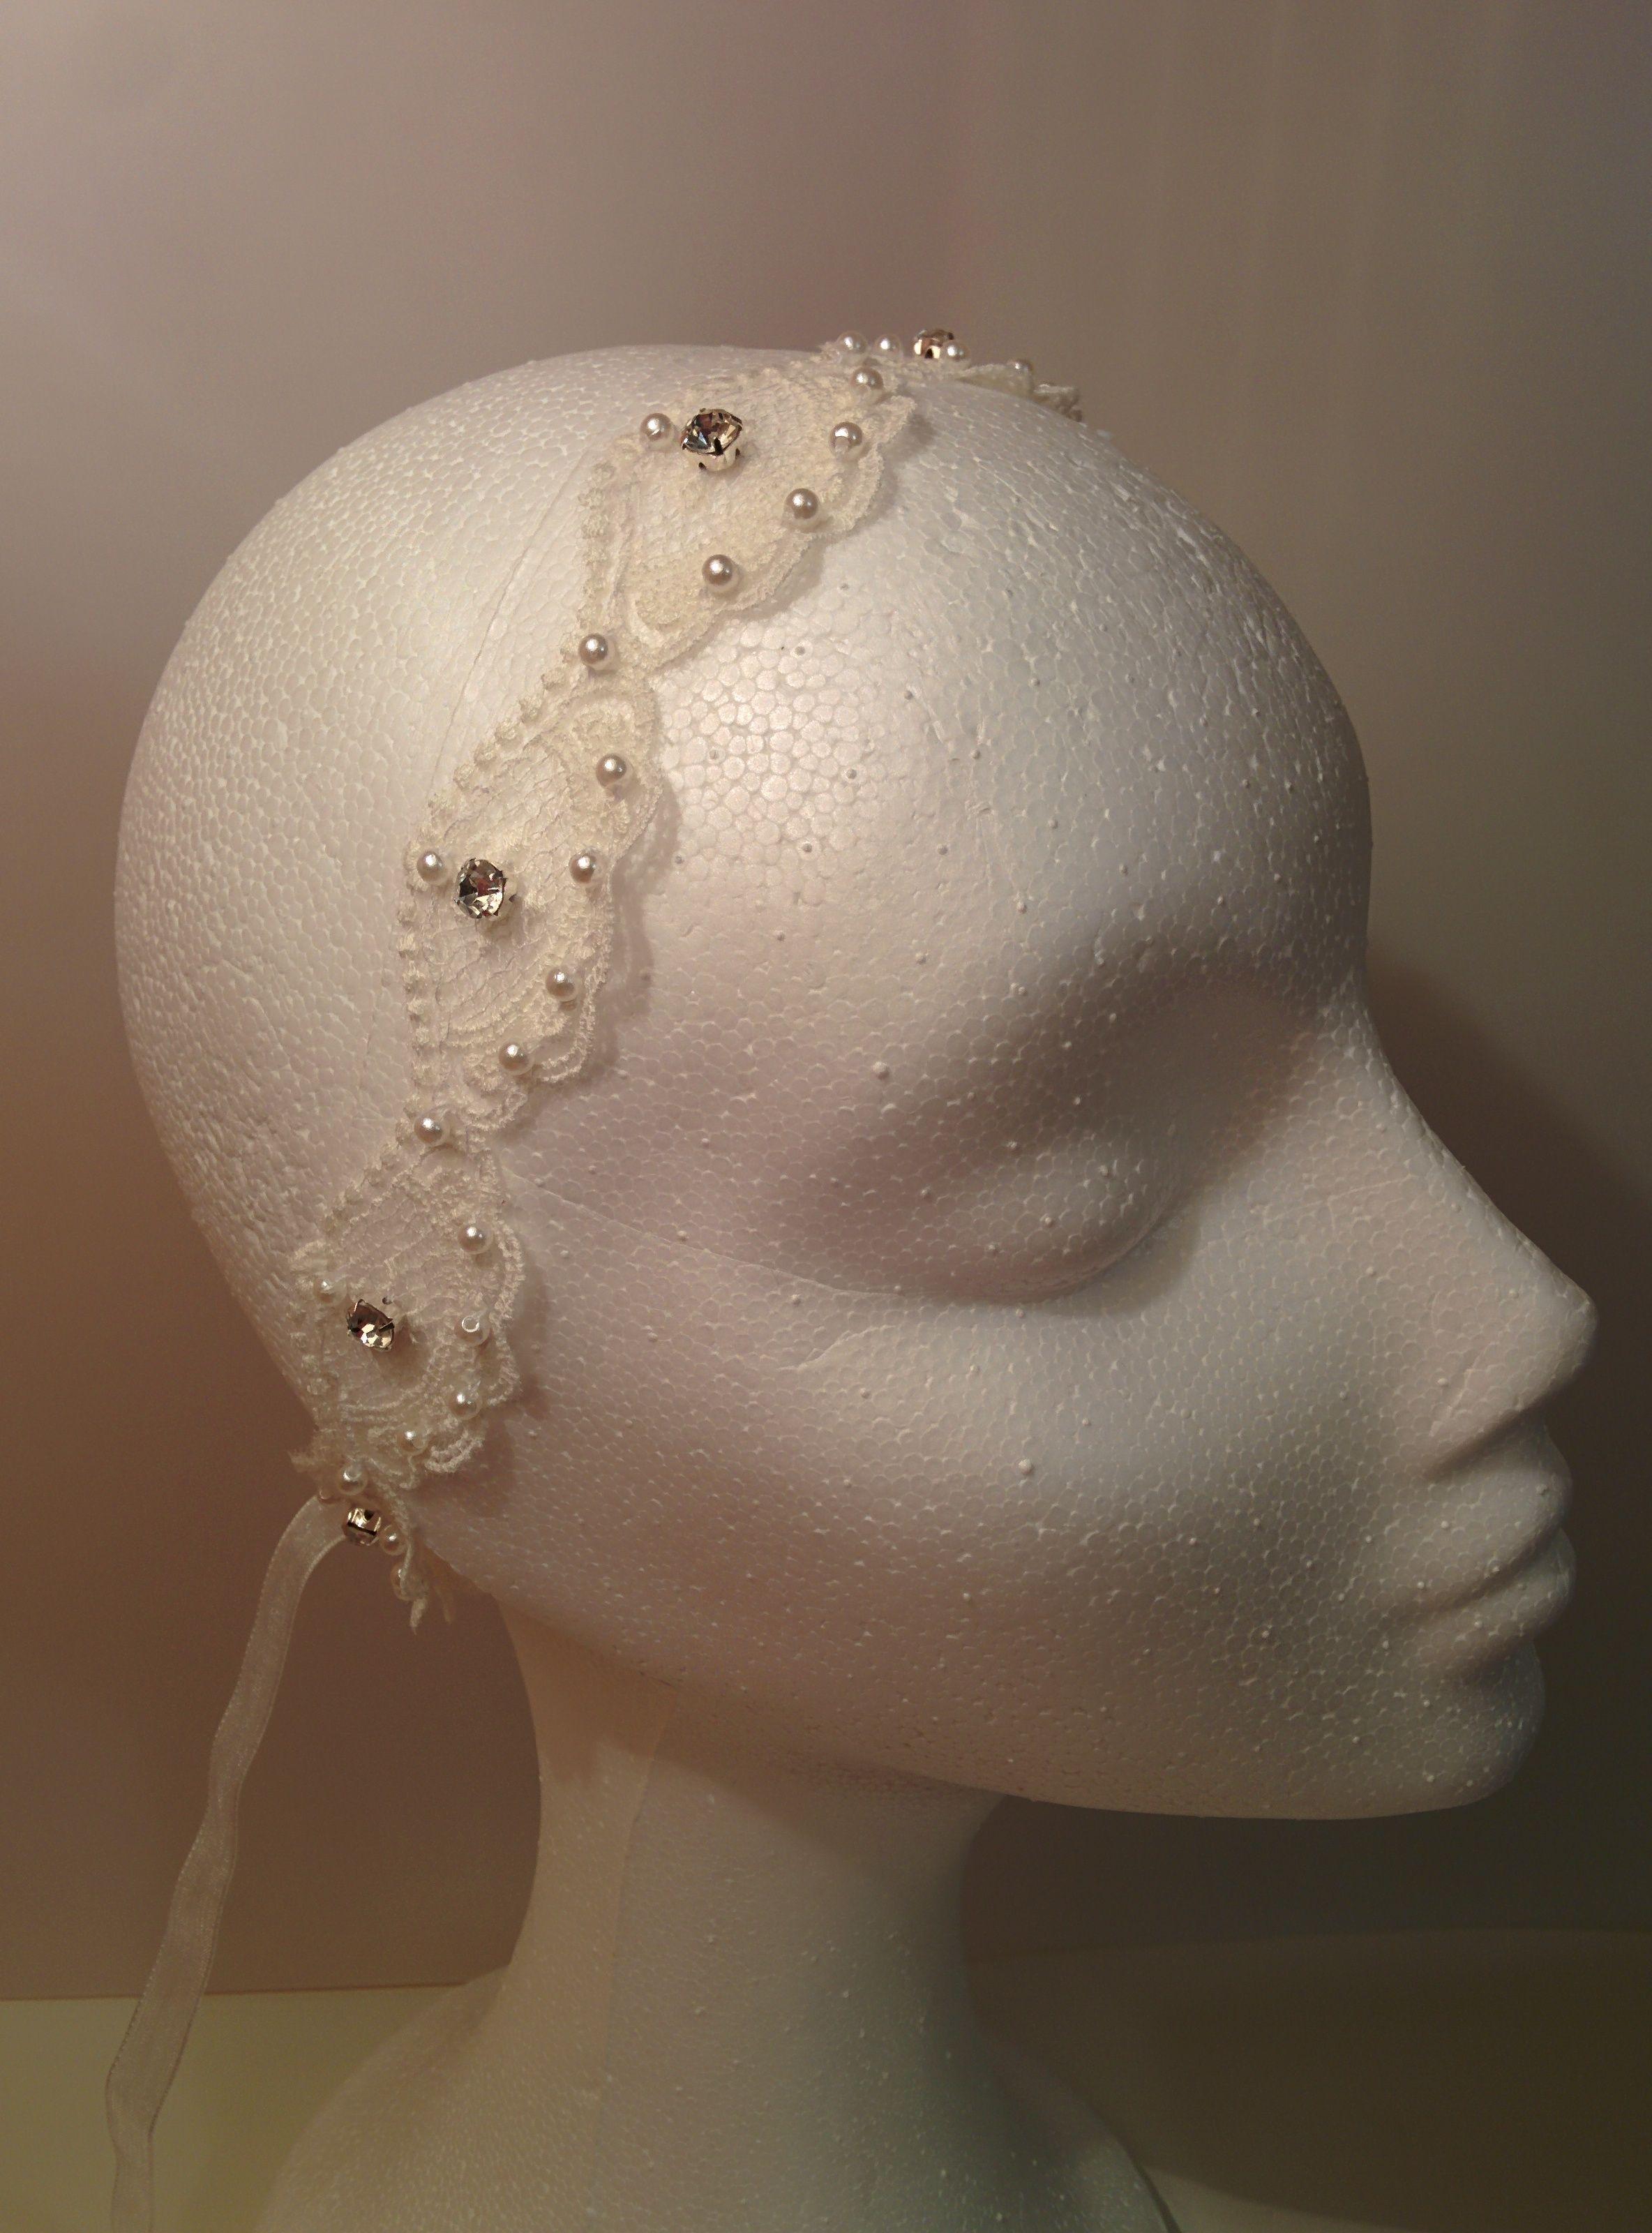 Puesta como diadema nos enamora el modelo Istar.  #lamoradadenoa #cinta #cintadepelo #pedreria #brillantes #perlas #coser #diadema